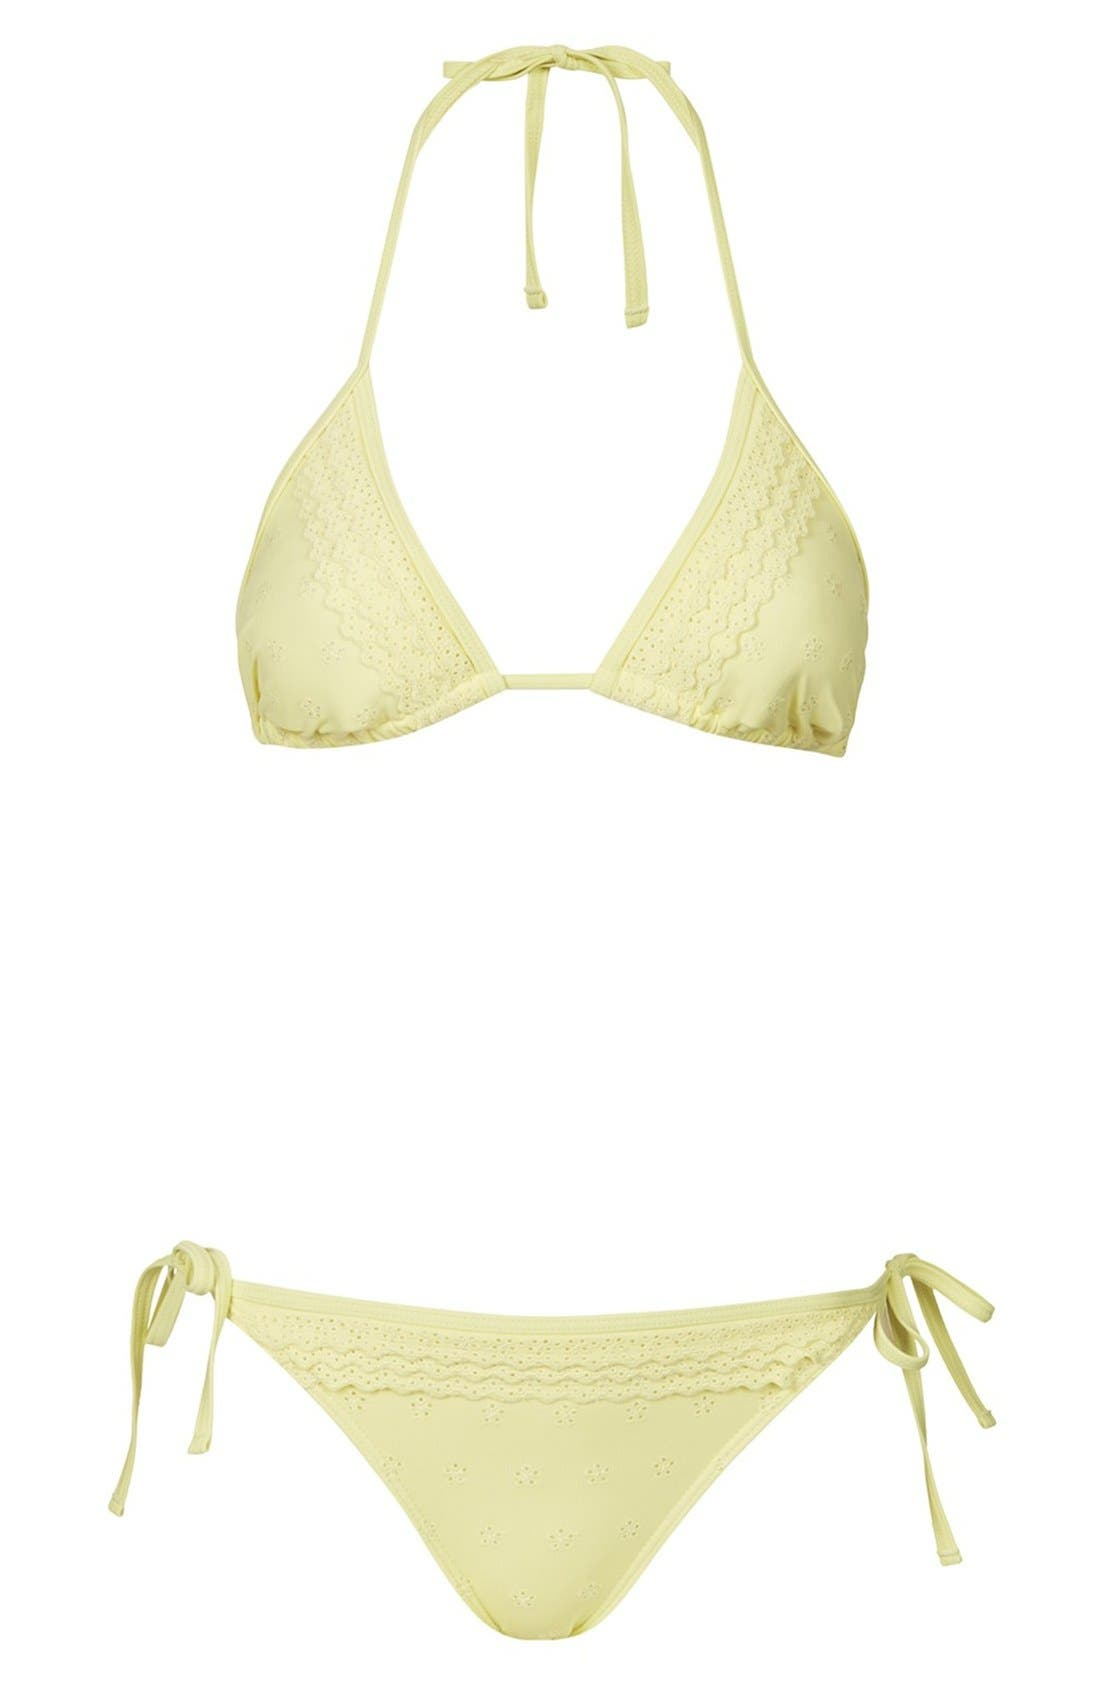 Main Image - Topshop 'Broderie Frill' Eyelet Bikini